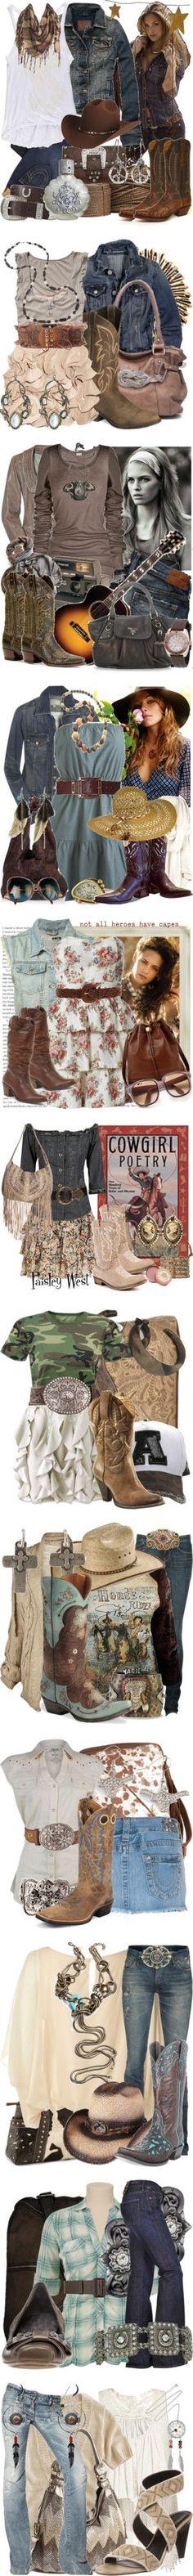 Corral Ladies Antiqued Black w/ White Inlay Snip Toe Western Boot